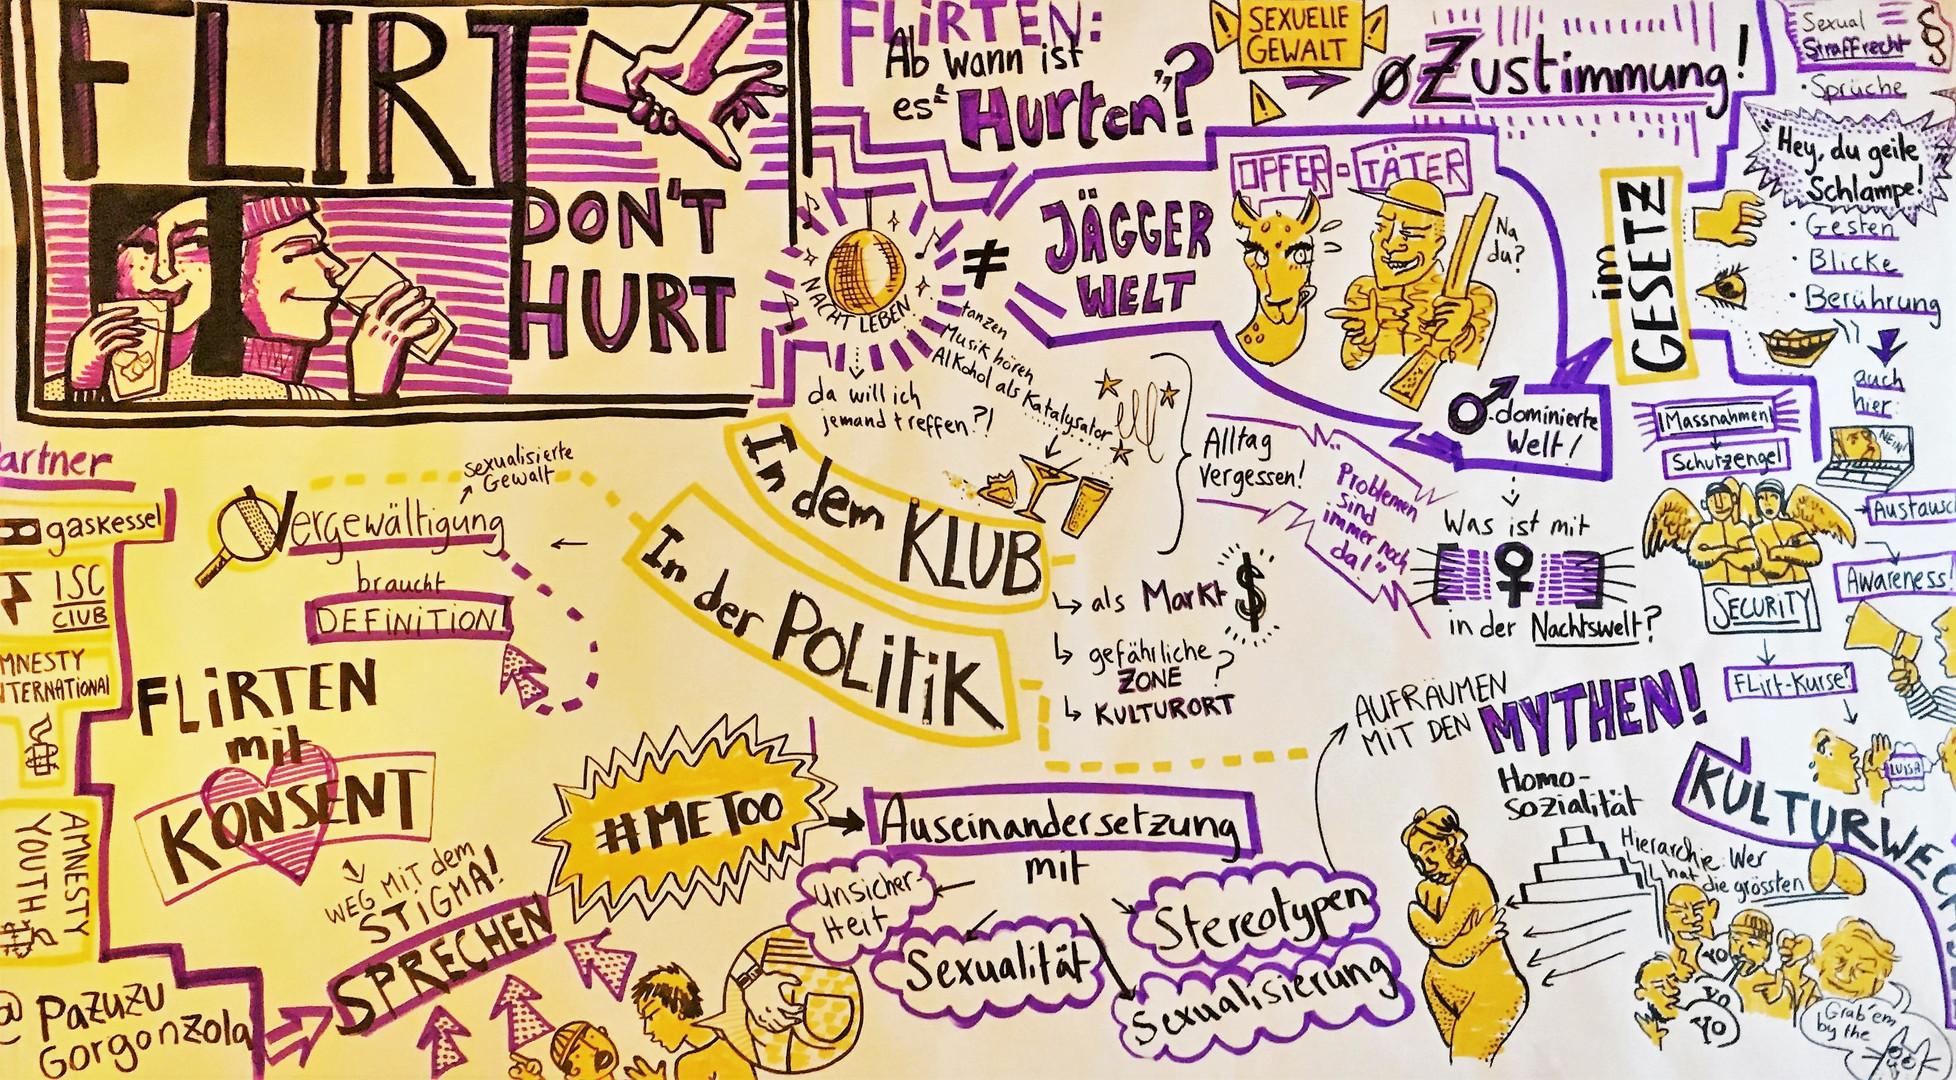 Flirt don't hurt - Amnesty